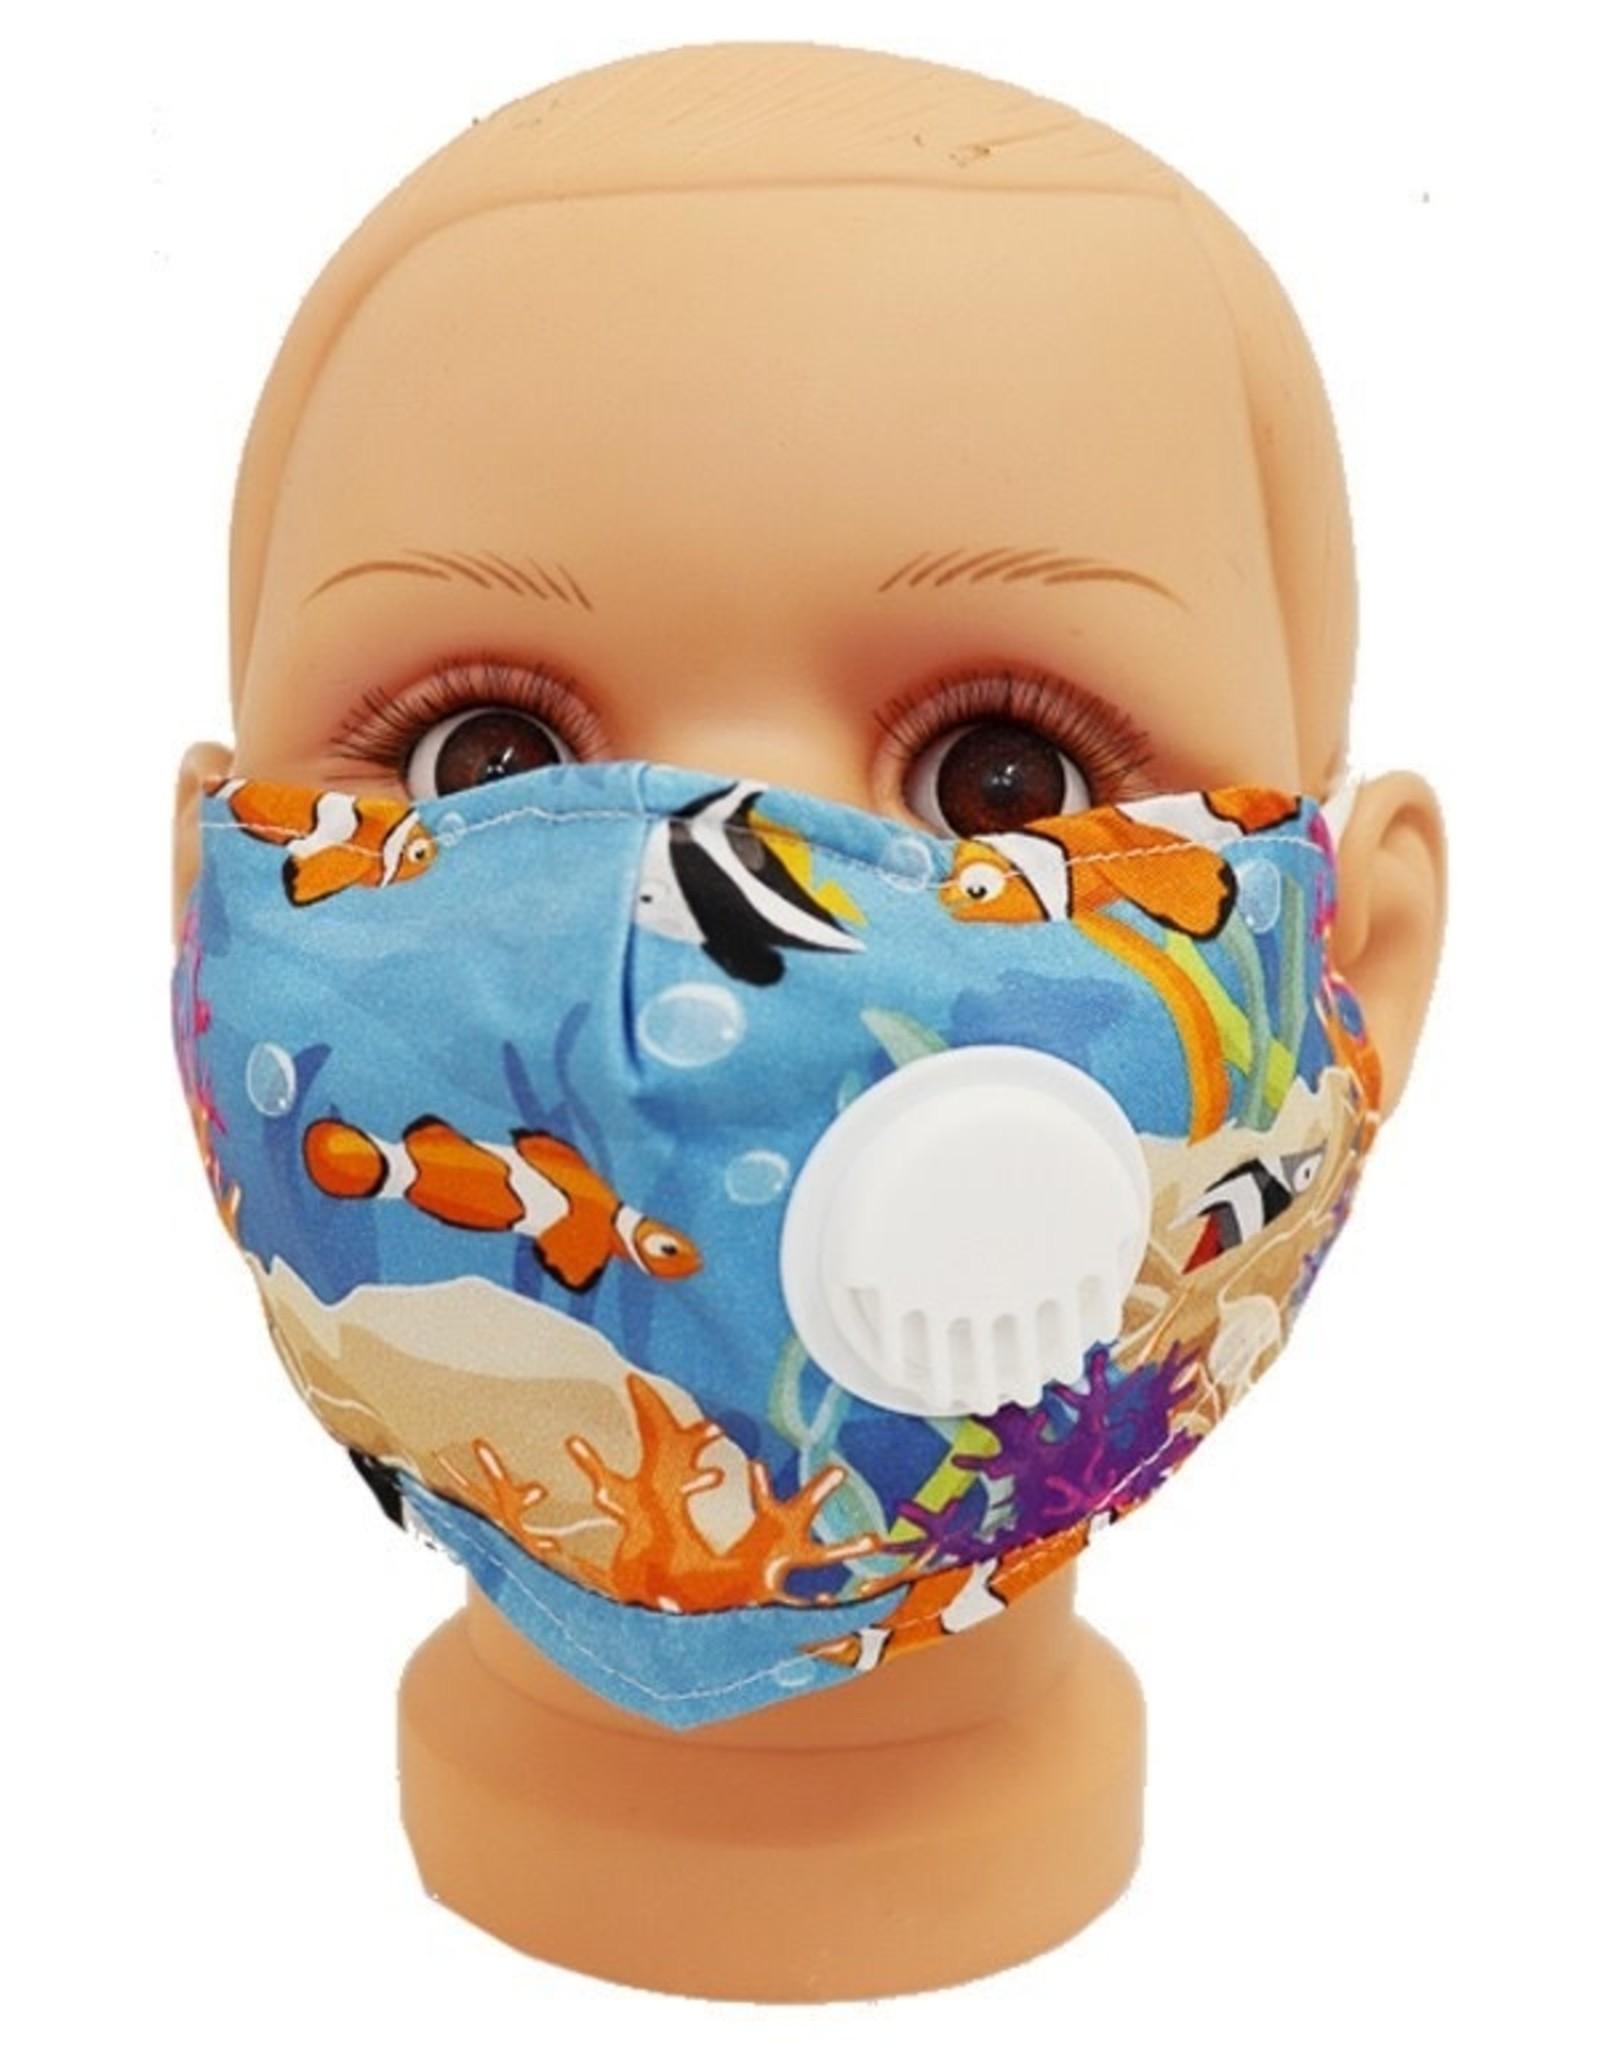 FACE MASK CHILD COTTON EZ BREATHE RESPIRATOR W/ FILTER POCKET BLUE FISH